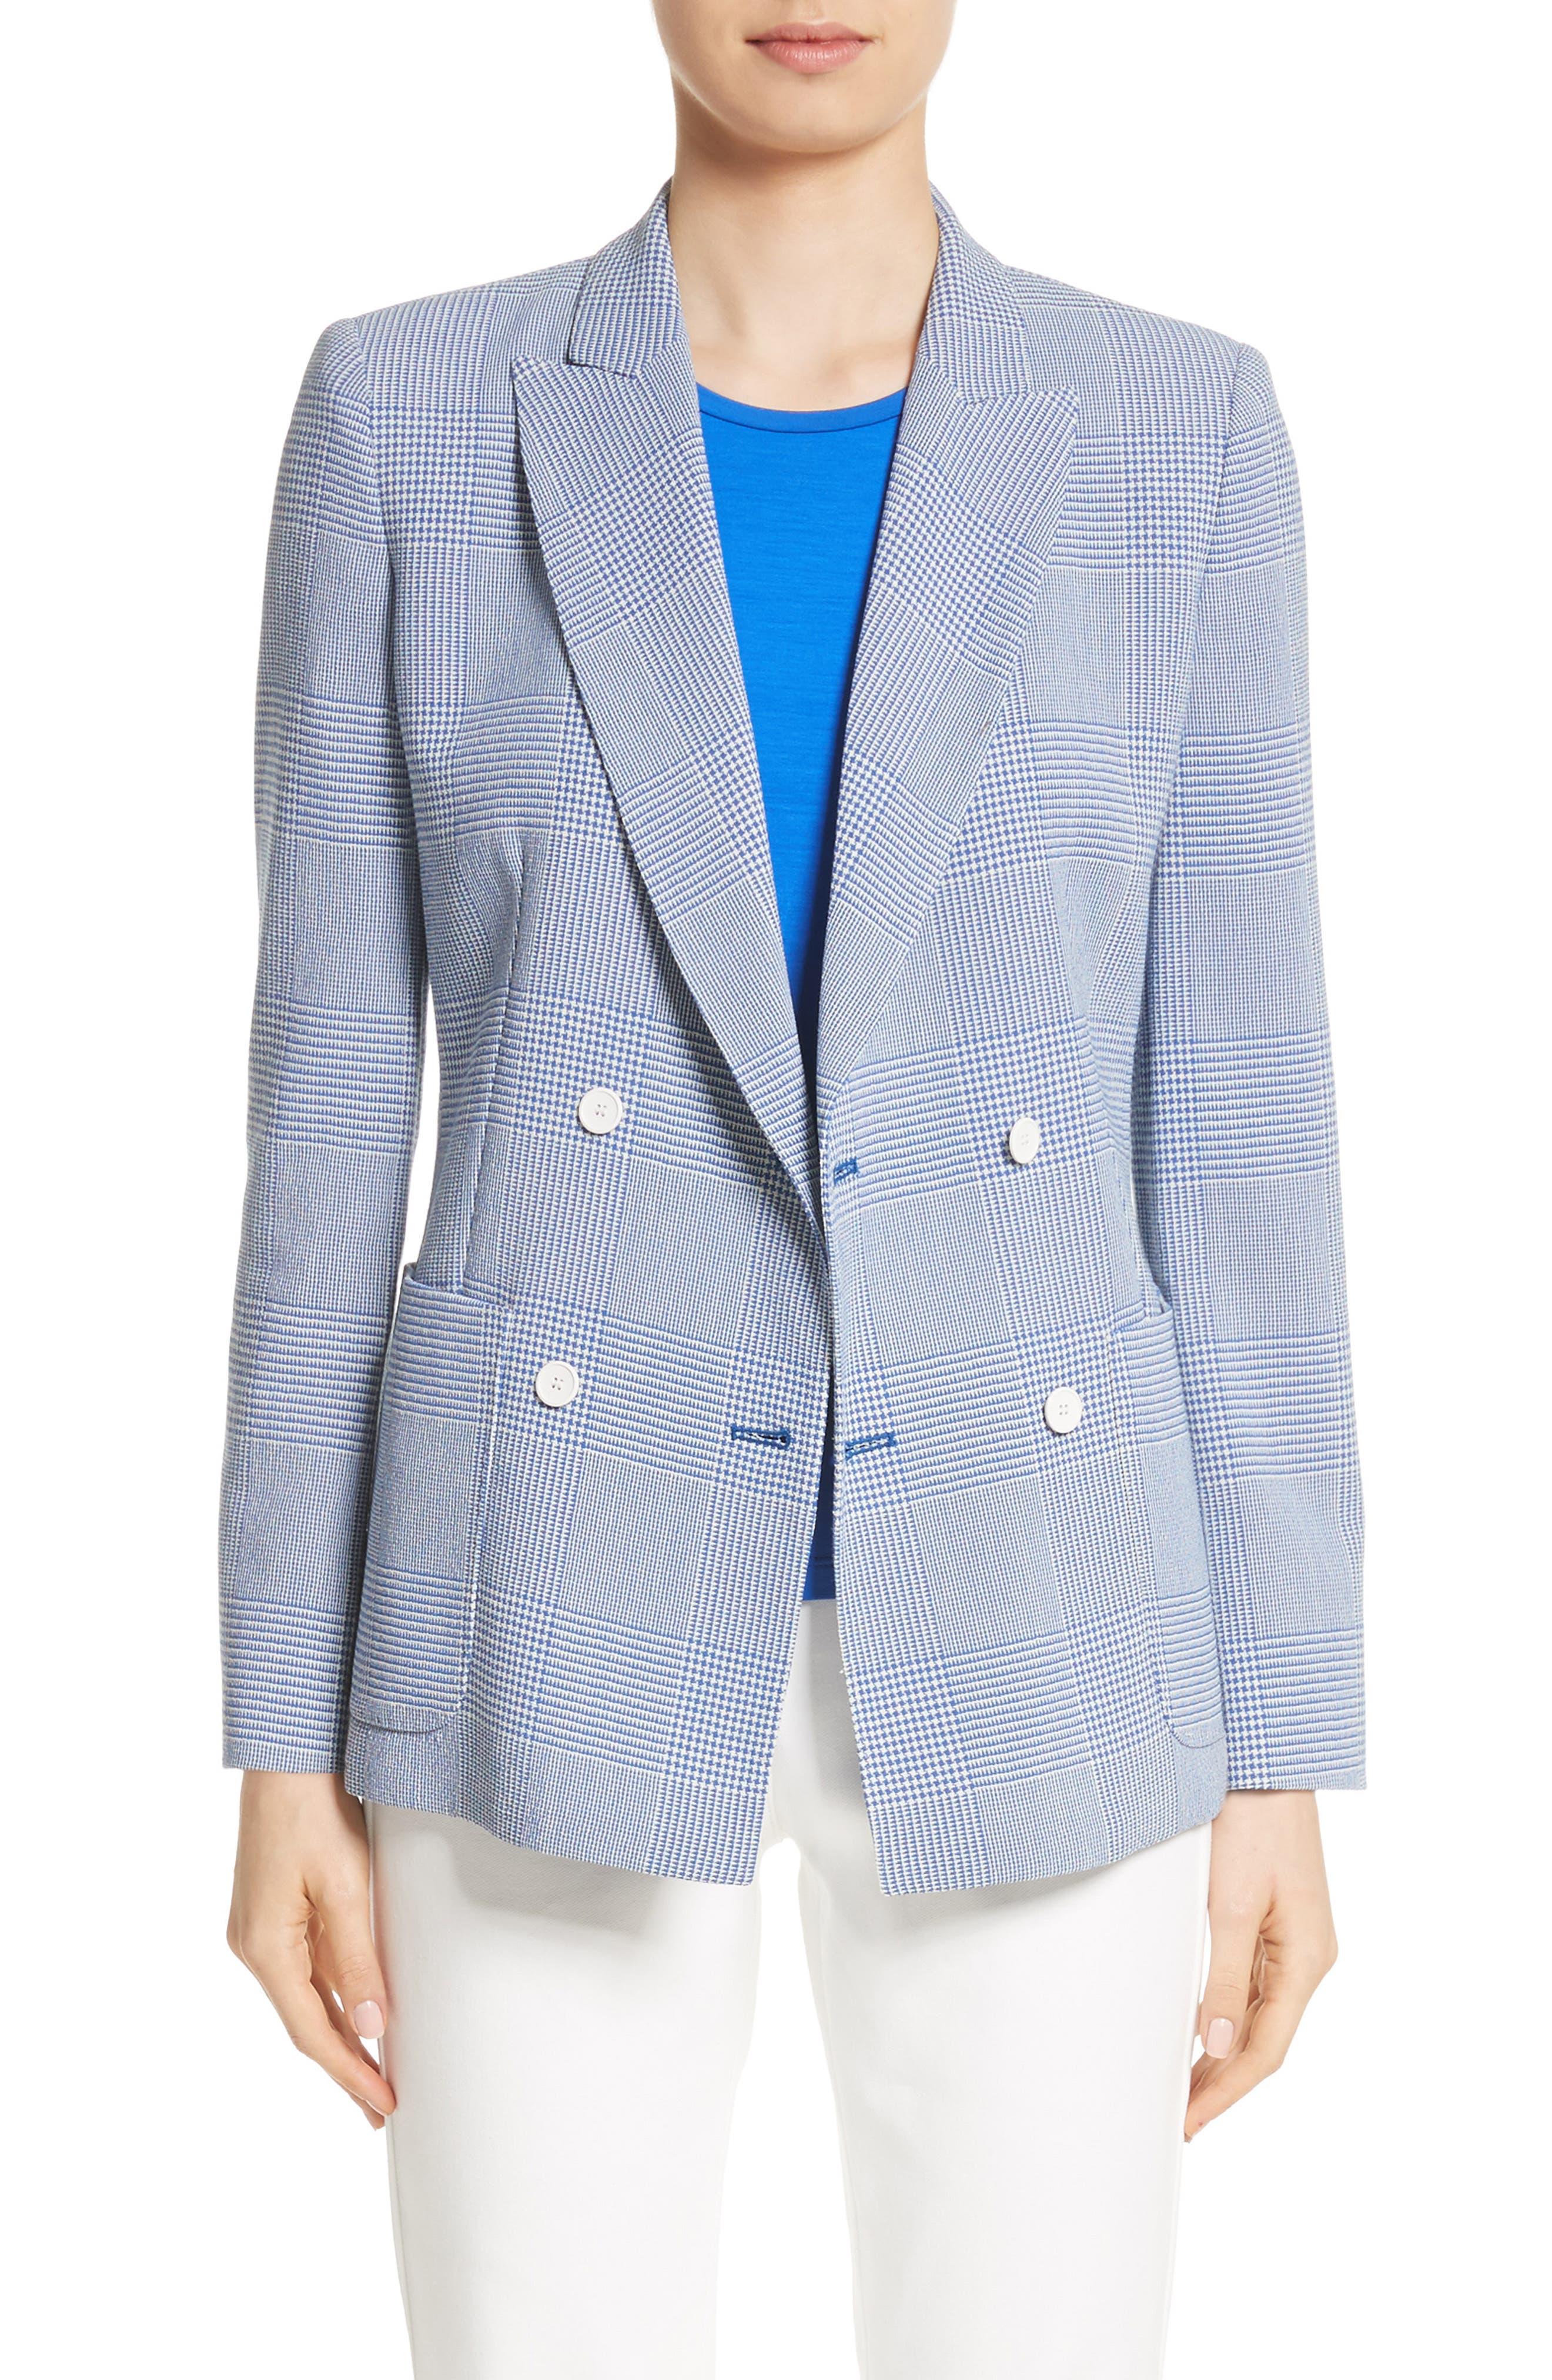 Ballata Check Wool Blazer,                         Main,                         color, 404